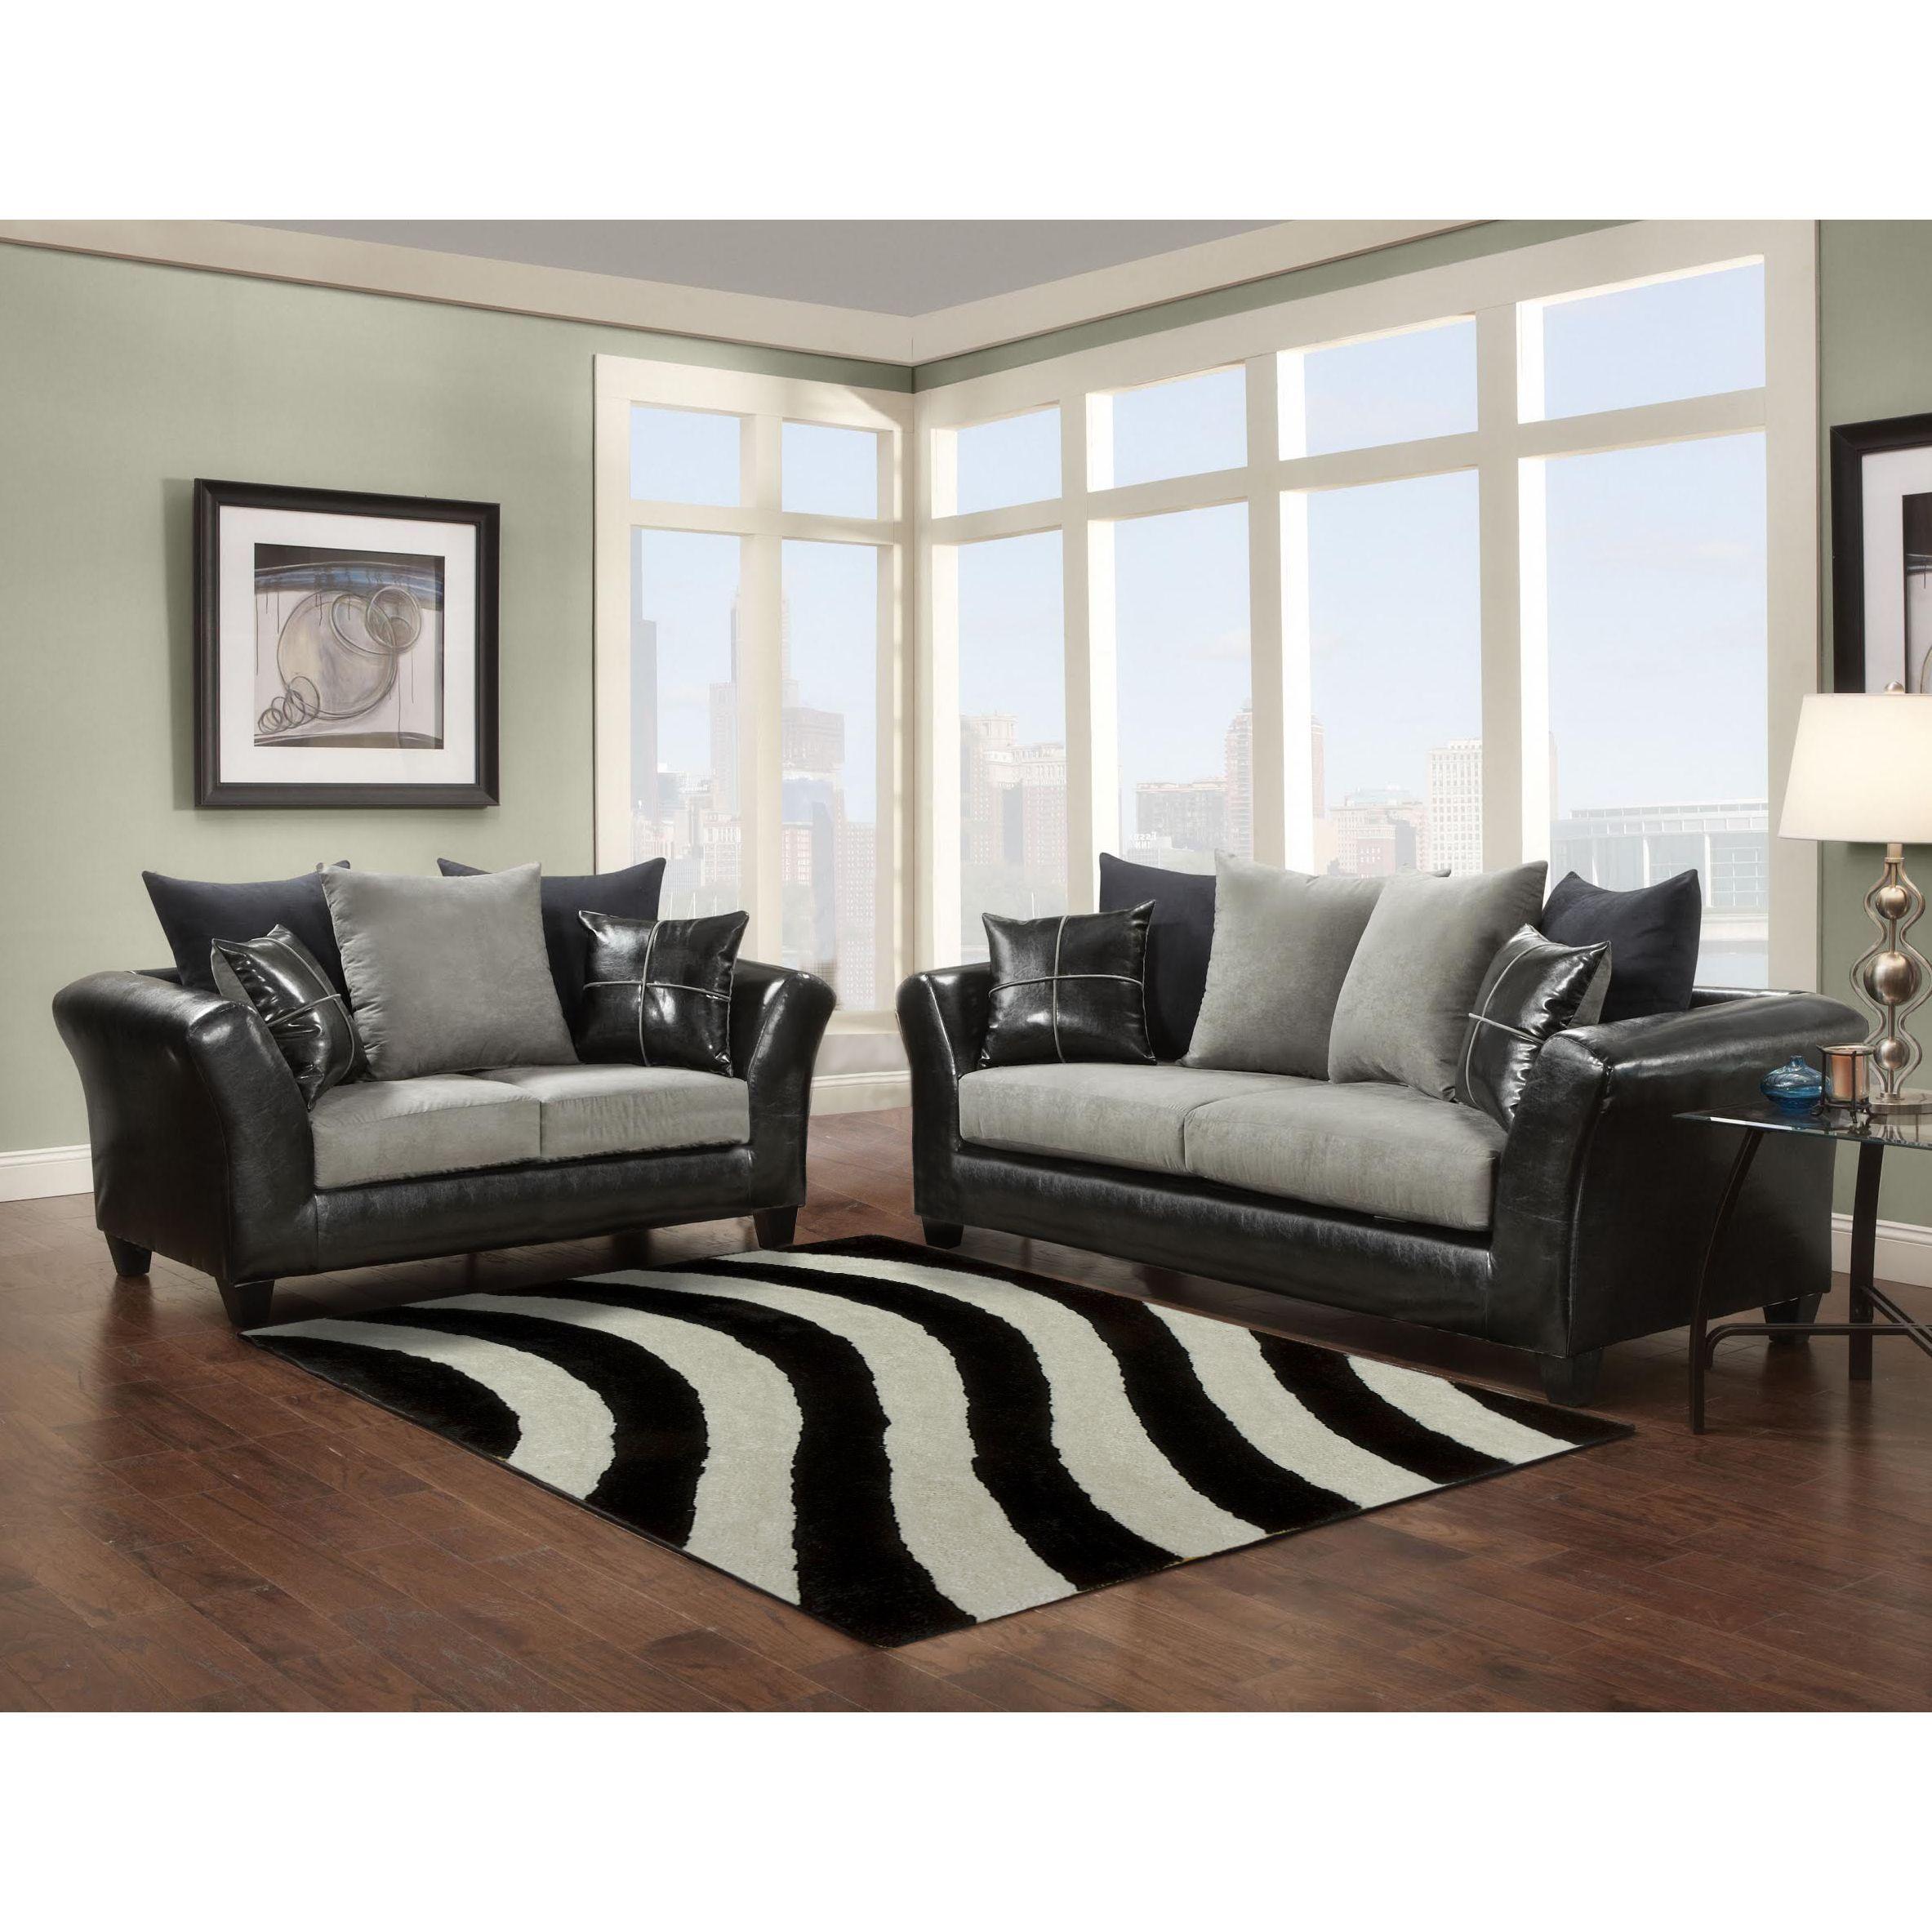 Soft Trendz Chocolate Grey Microfiber Faux Leather Sofa and